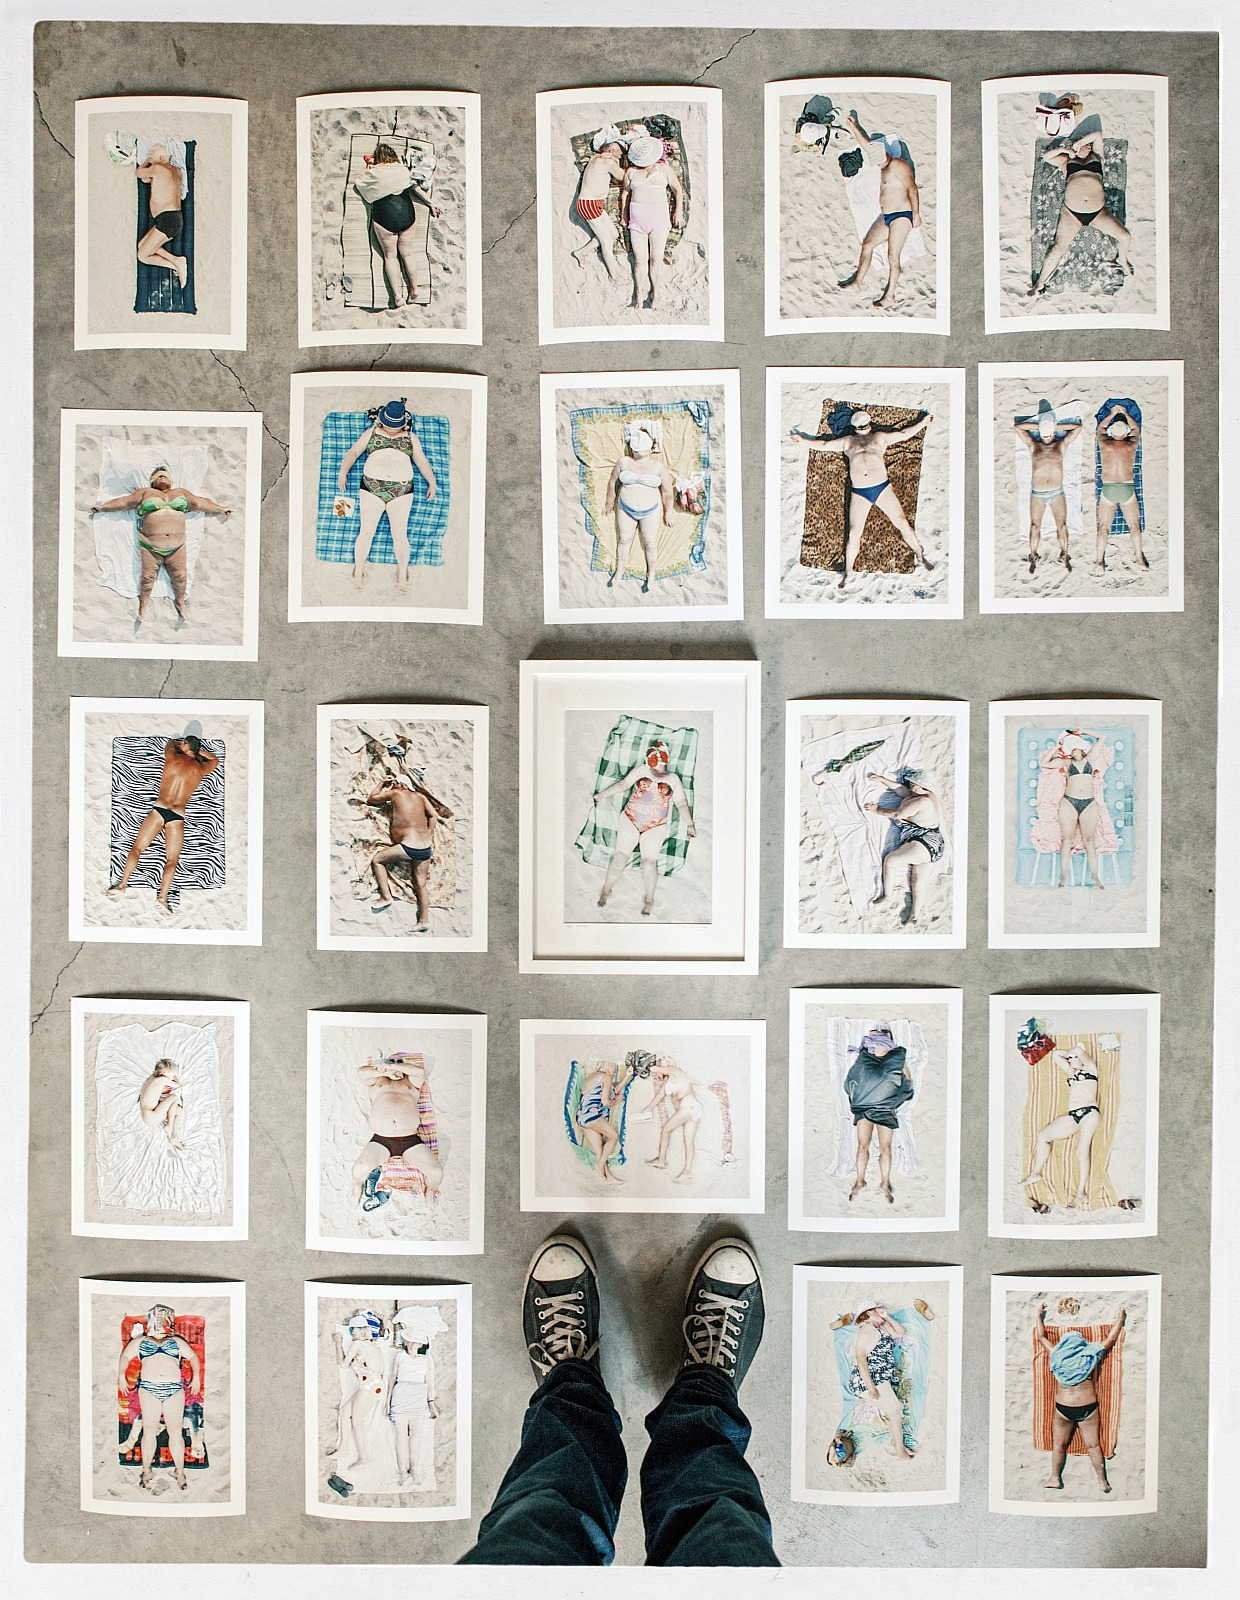 TADAOCERN CZ Full Collection A4 001.jpg